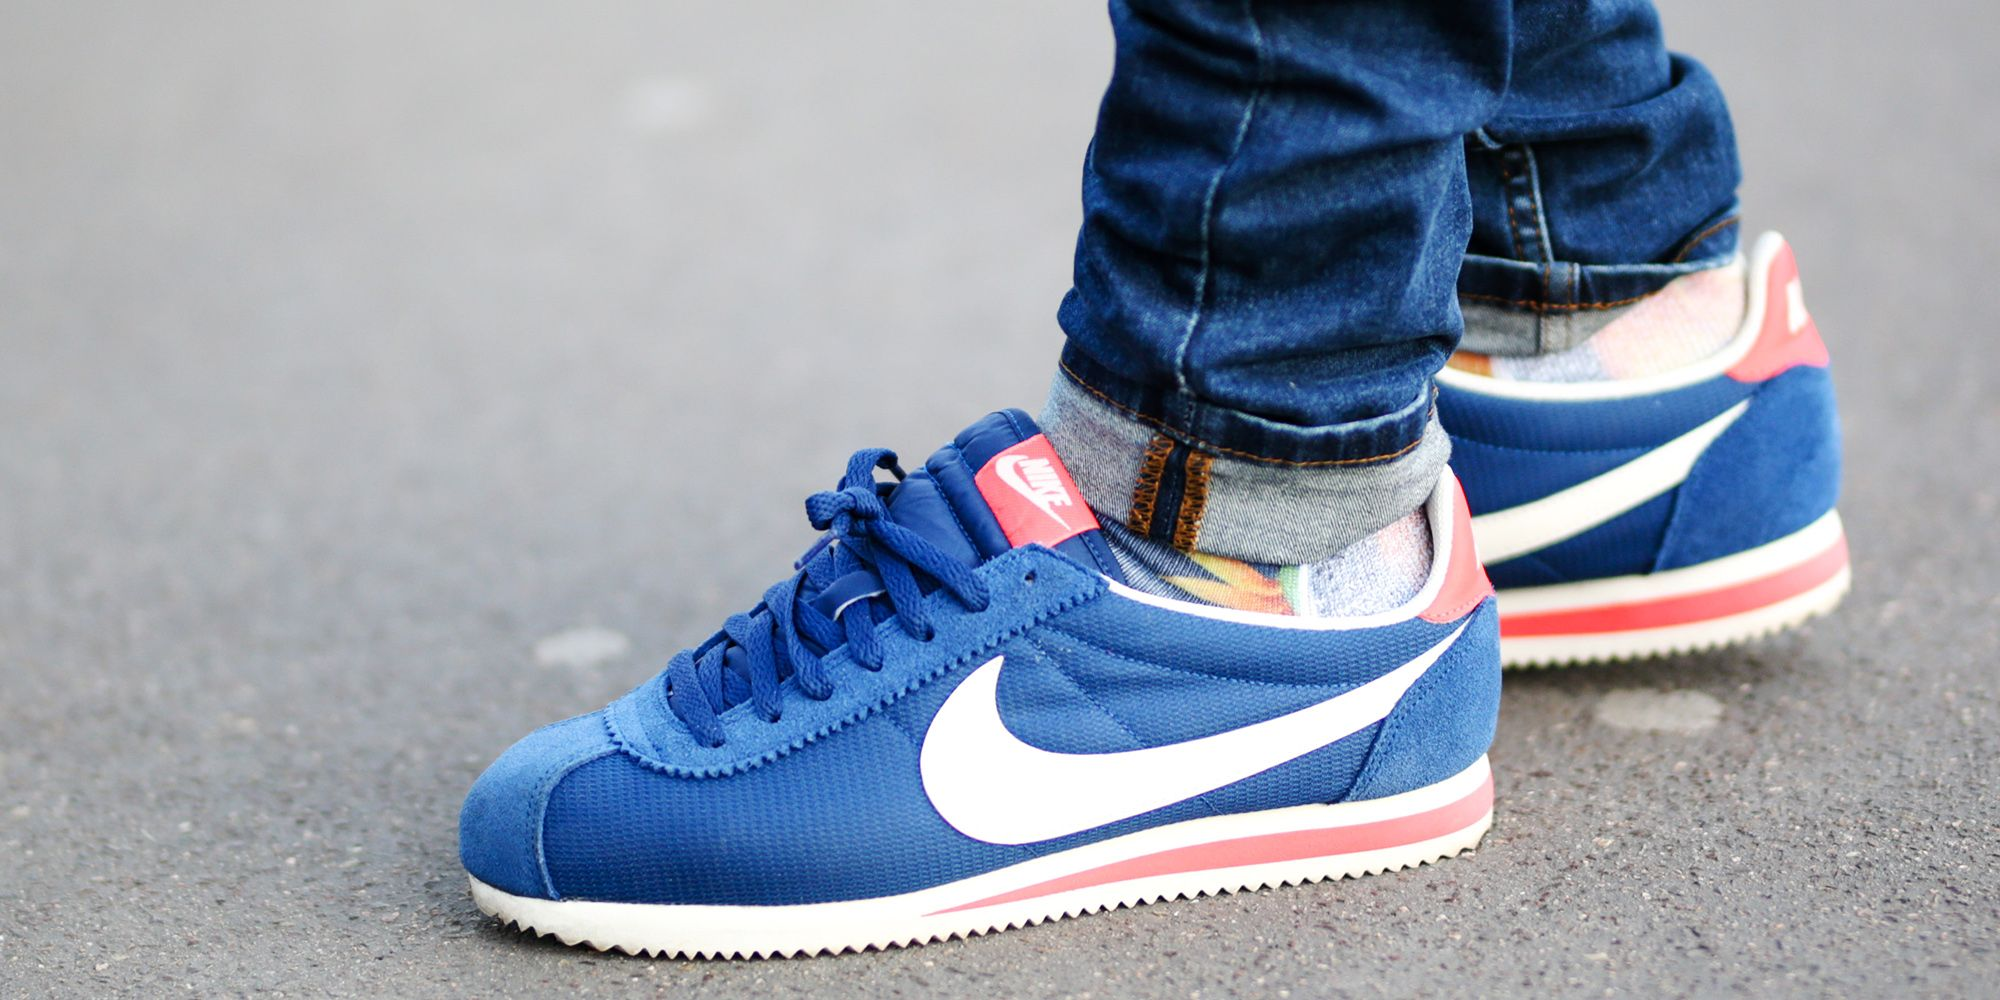 Cool Retro-Inspired Sneakers for Men